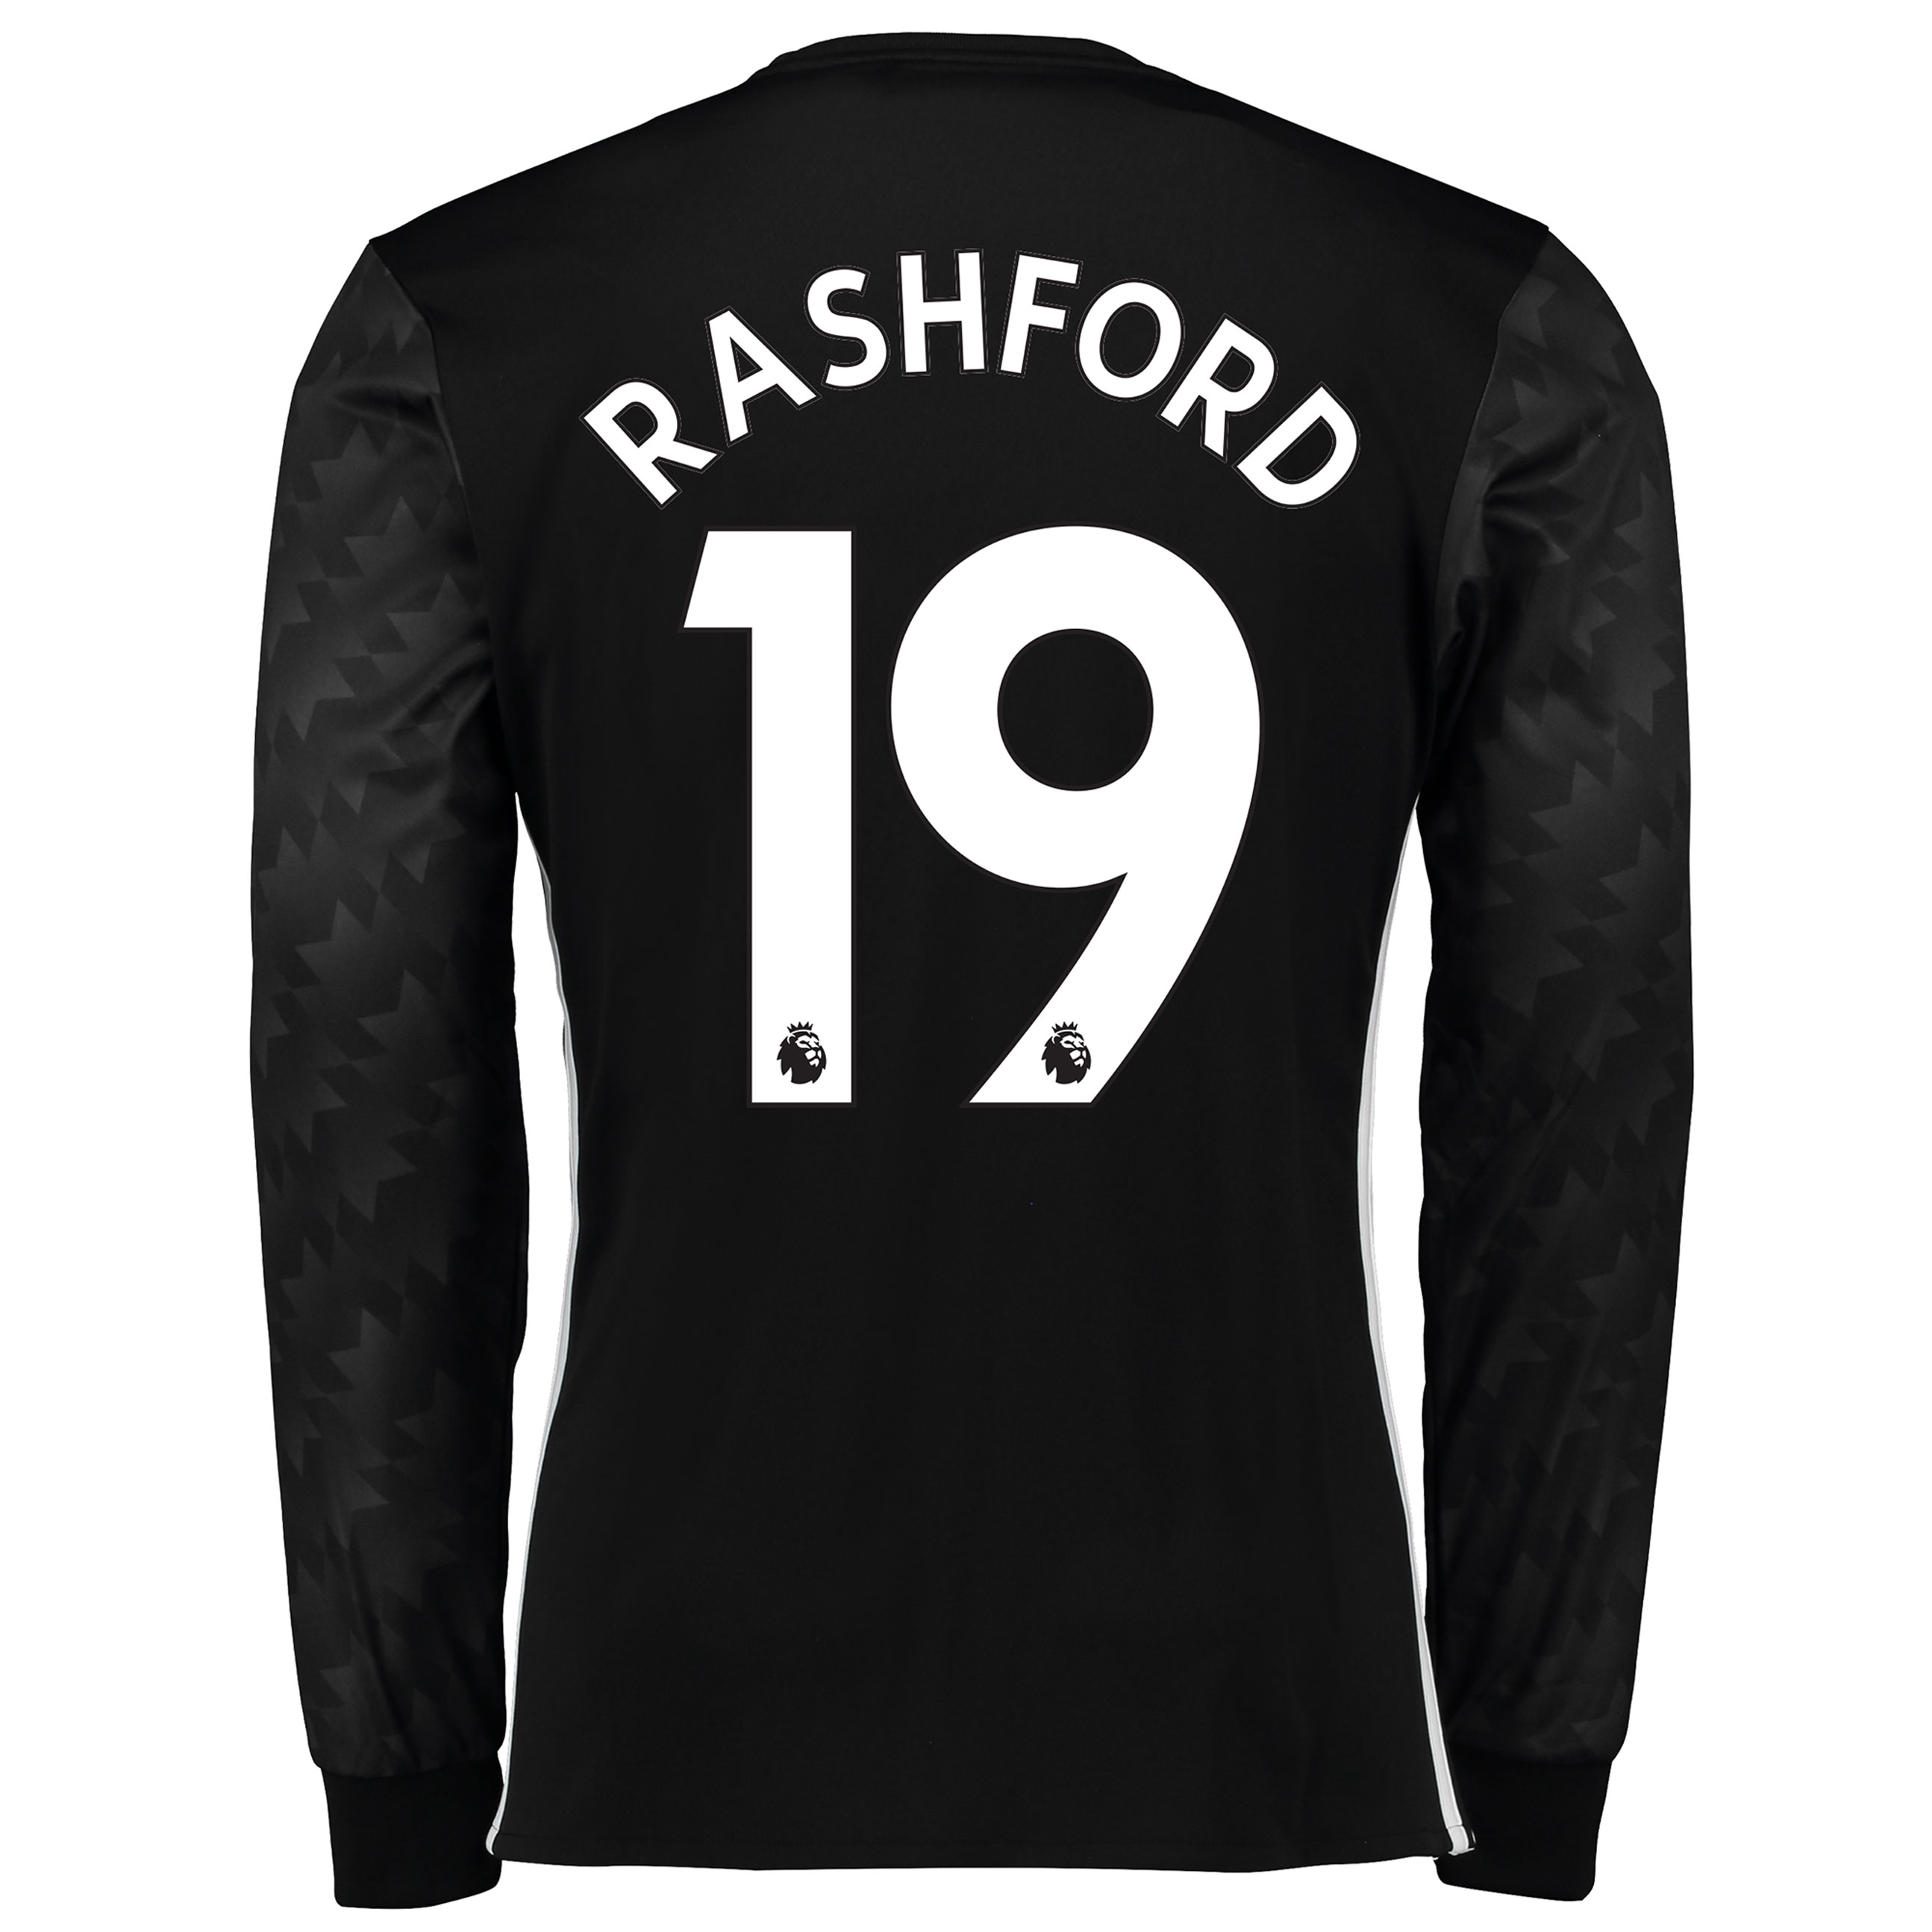 Manchester United Away Shirt 2017-18 - Long Sleeve with Rashford 19 pr